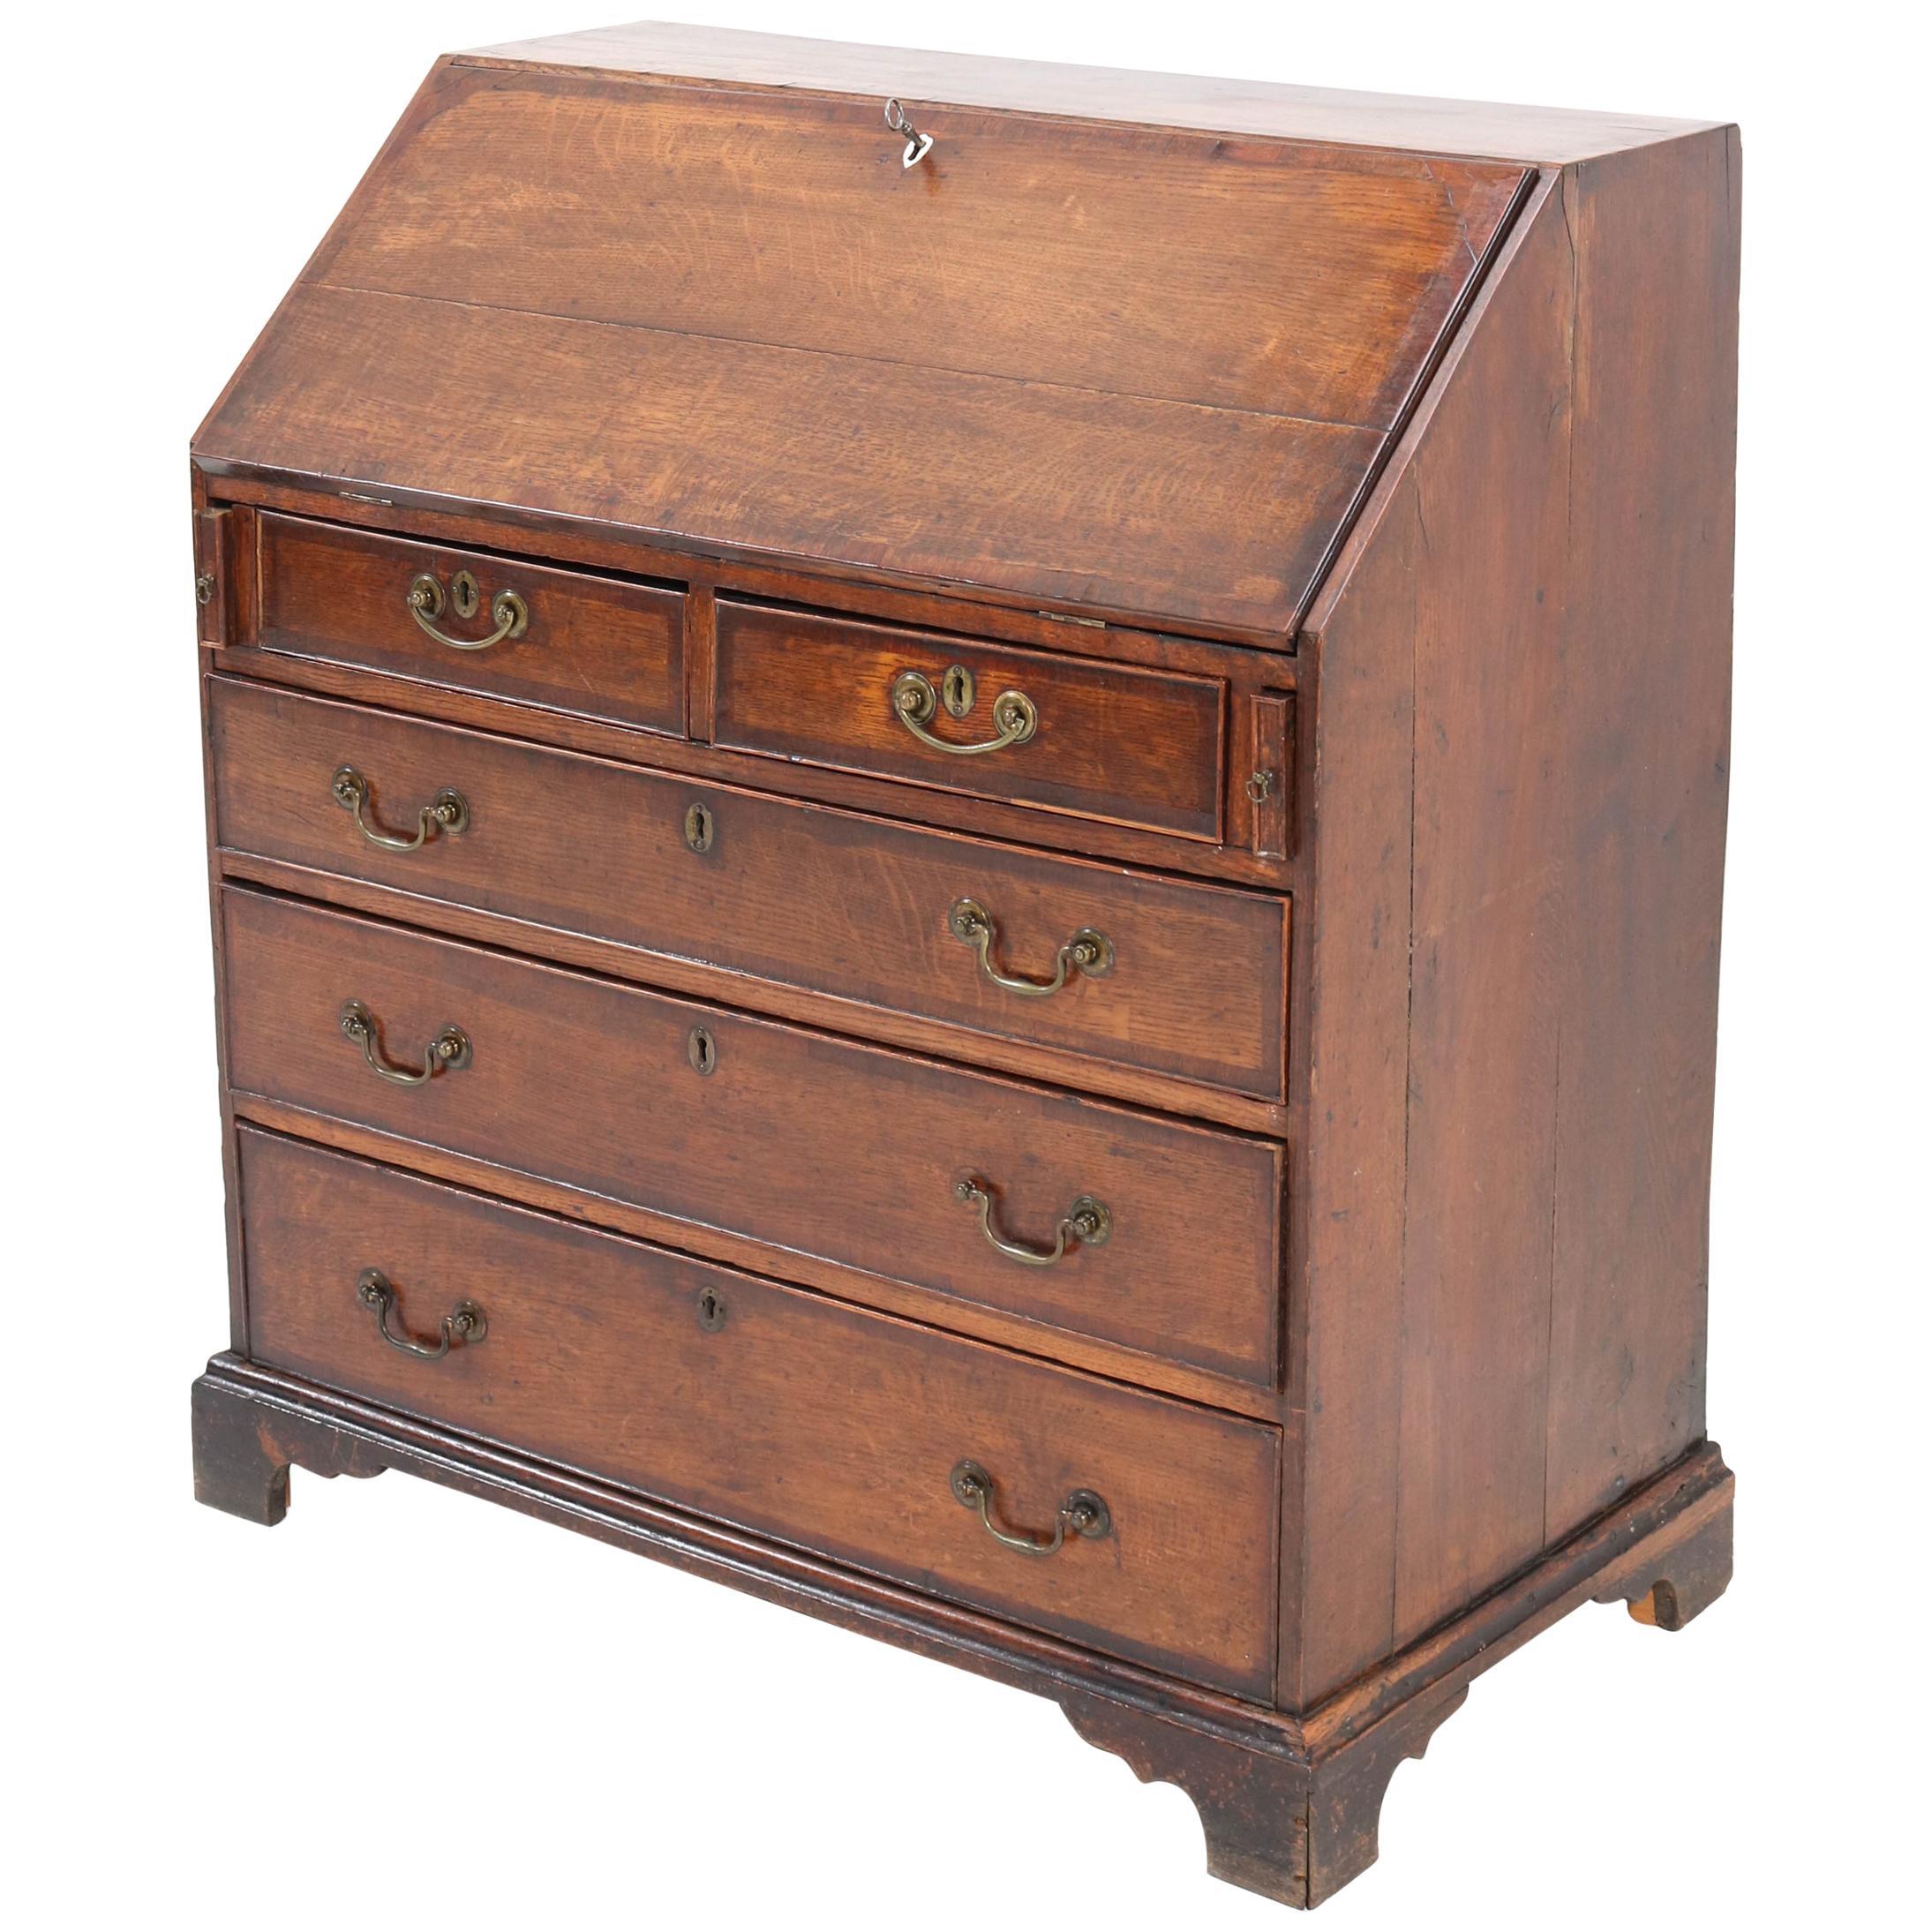 Oak English George III Slant Front Desk, Late 18th Century